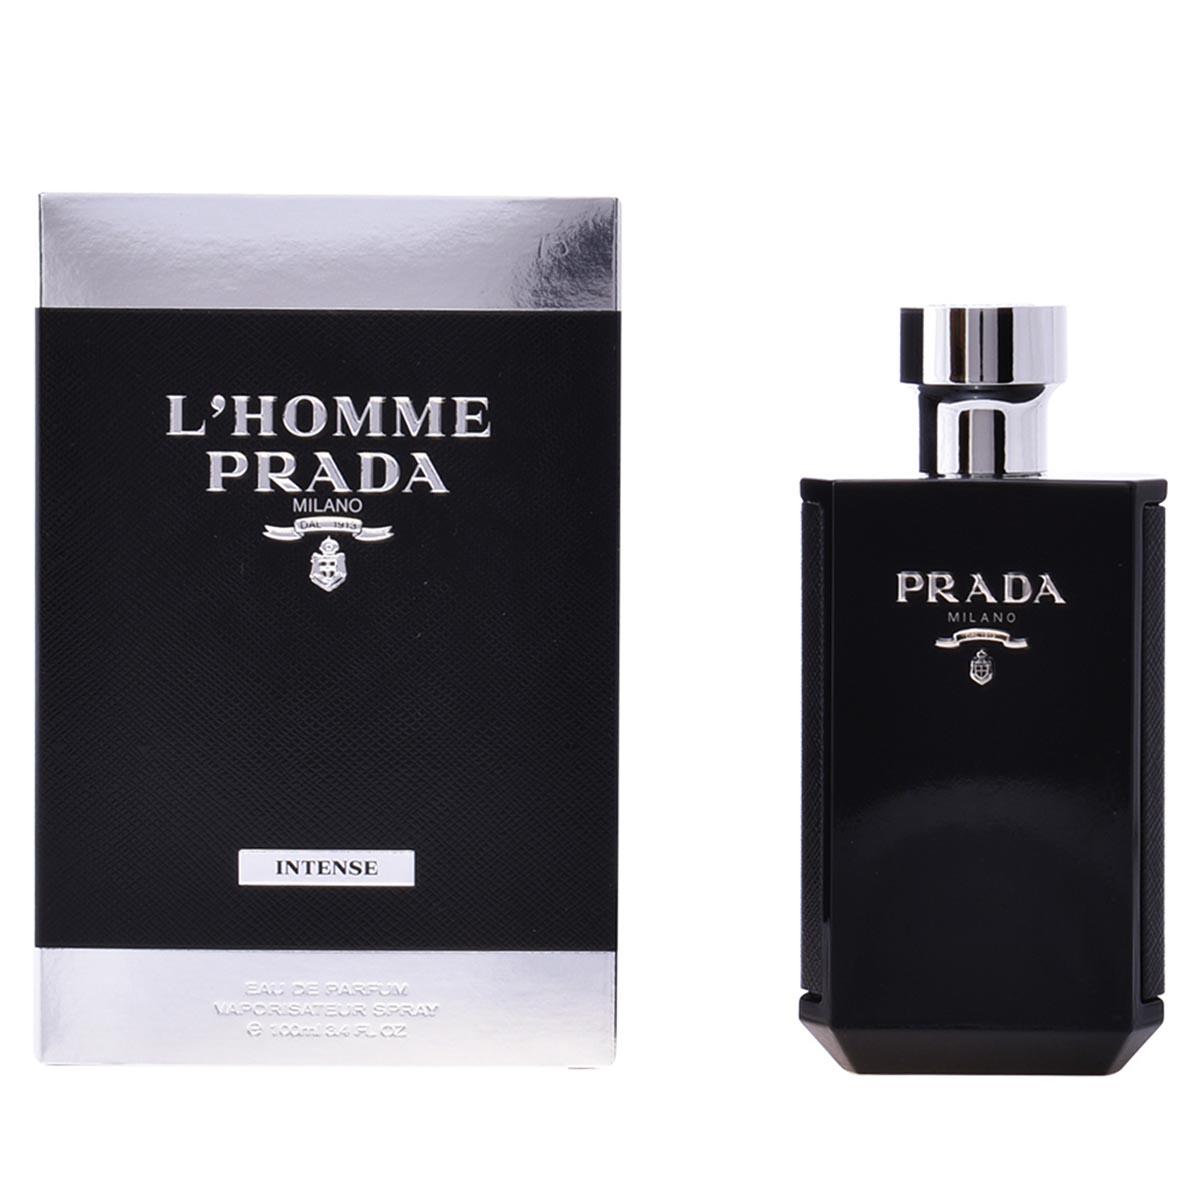 Prada homme intense eau de parfum 100ml vaporizador